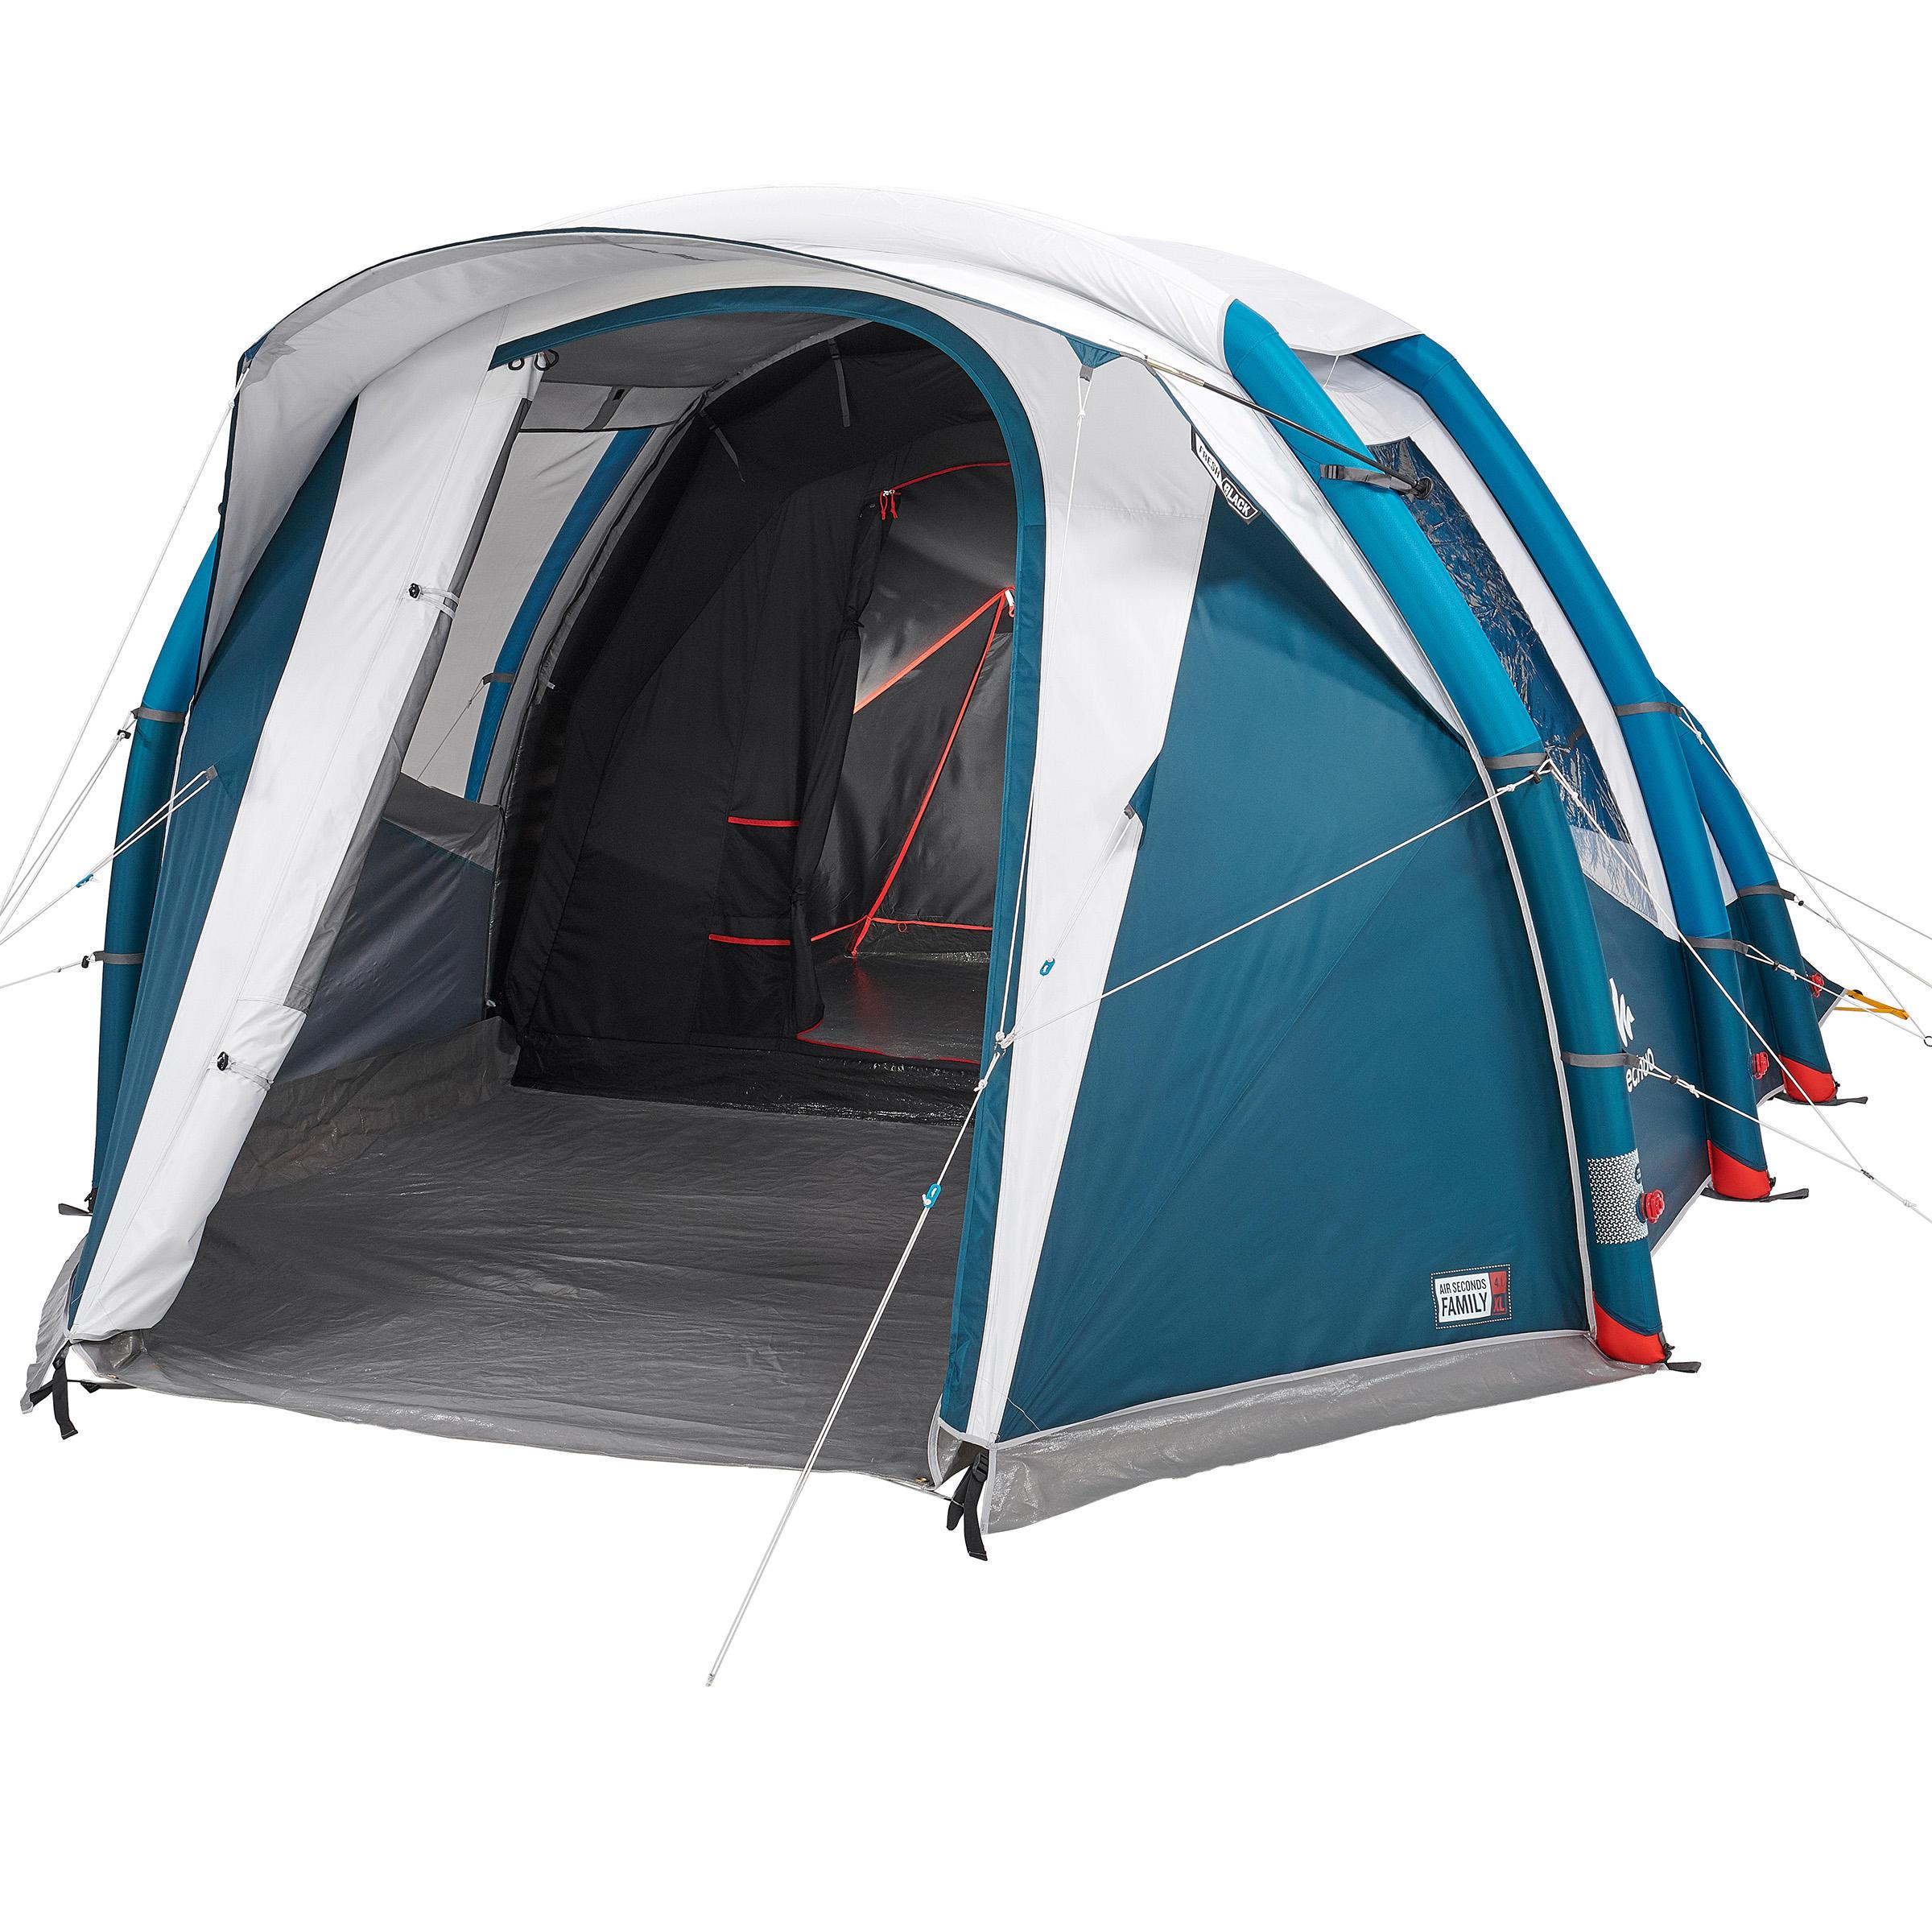 Quechua Tent | 4 personen opblaasbaar AIR SECONDS 4.1 FRESH&BLACK | 1 binnentent